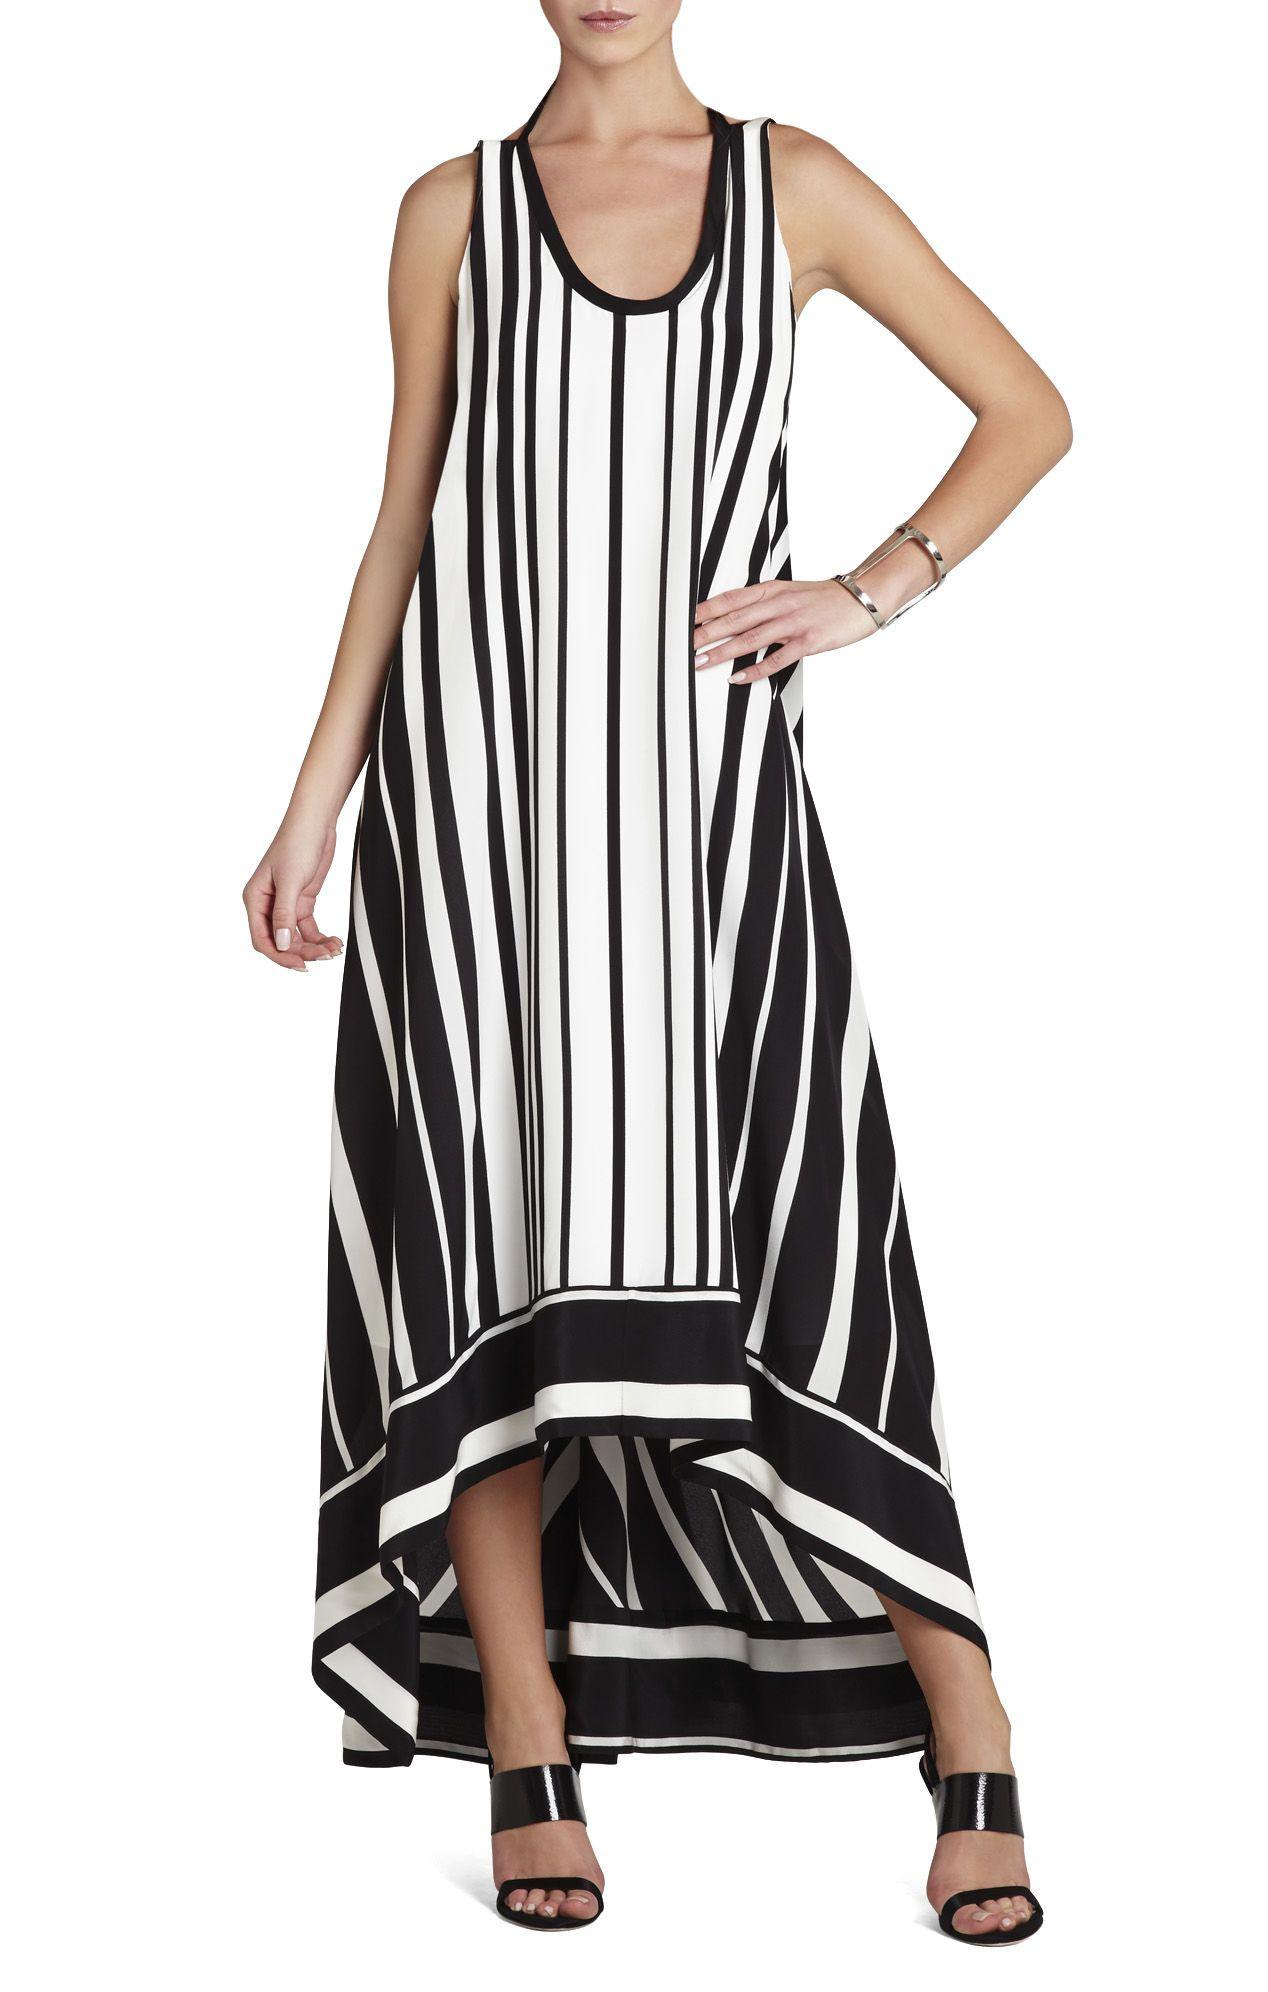 Gia Vertical-Striped Maxi Dress | Kleider | Pinterest | Maxi dresses